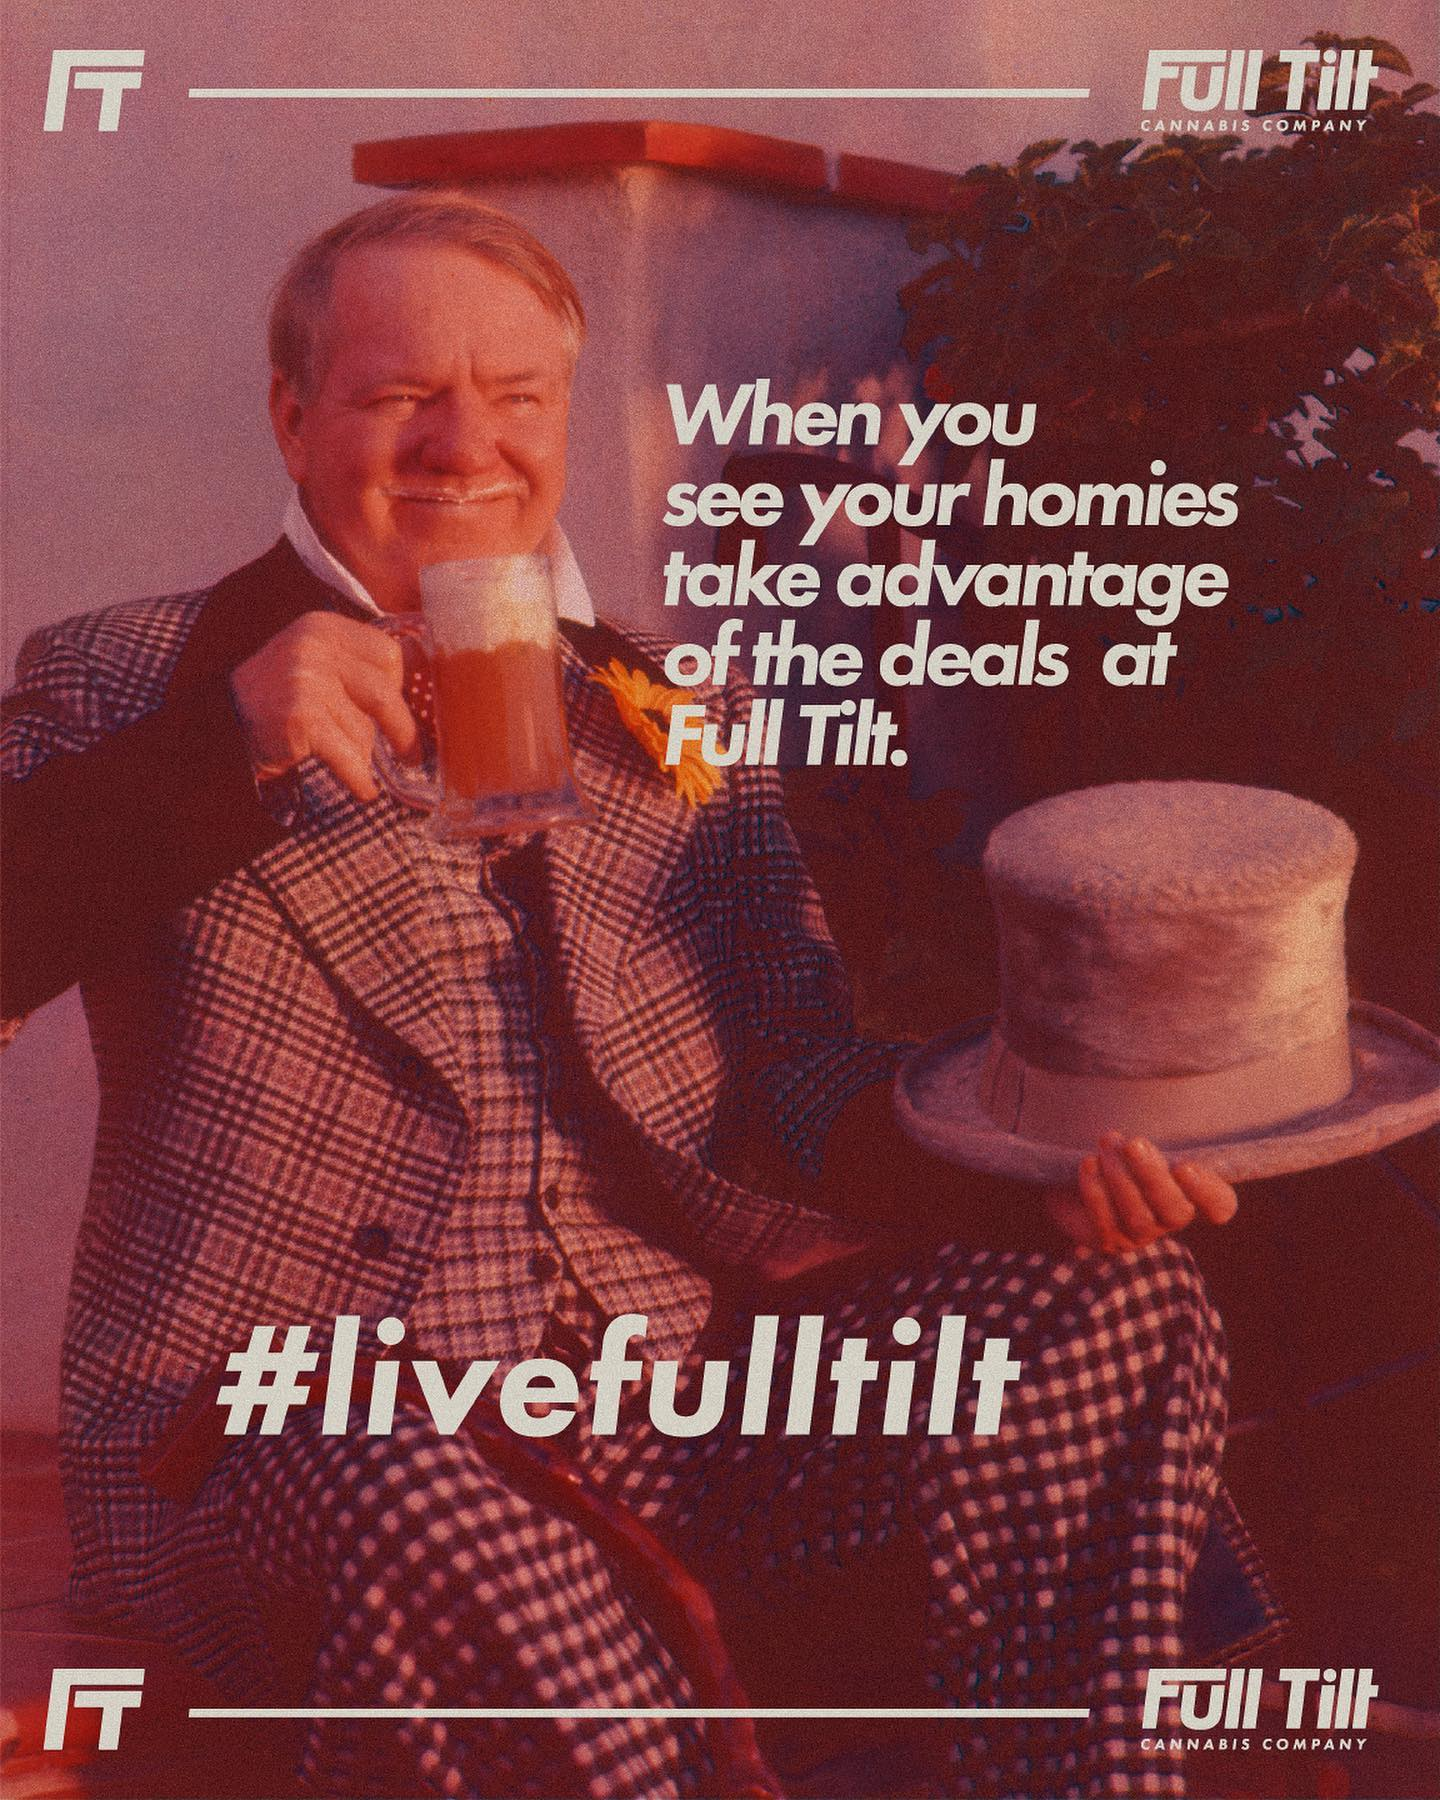 At Full Tilt, there's always a reason to celebrate! #livefulltilt #northeastoklahoma #oklahoma